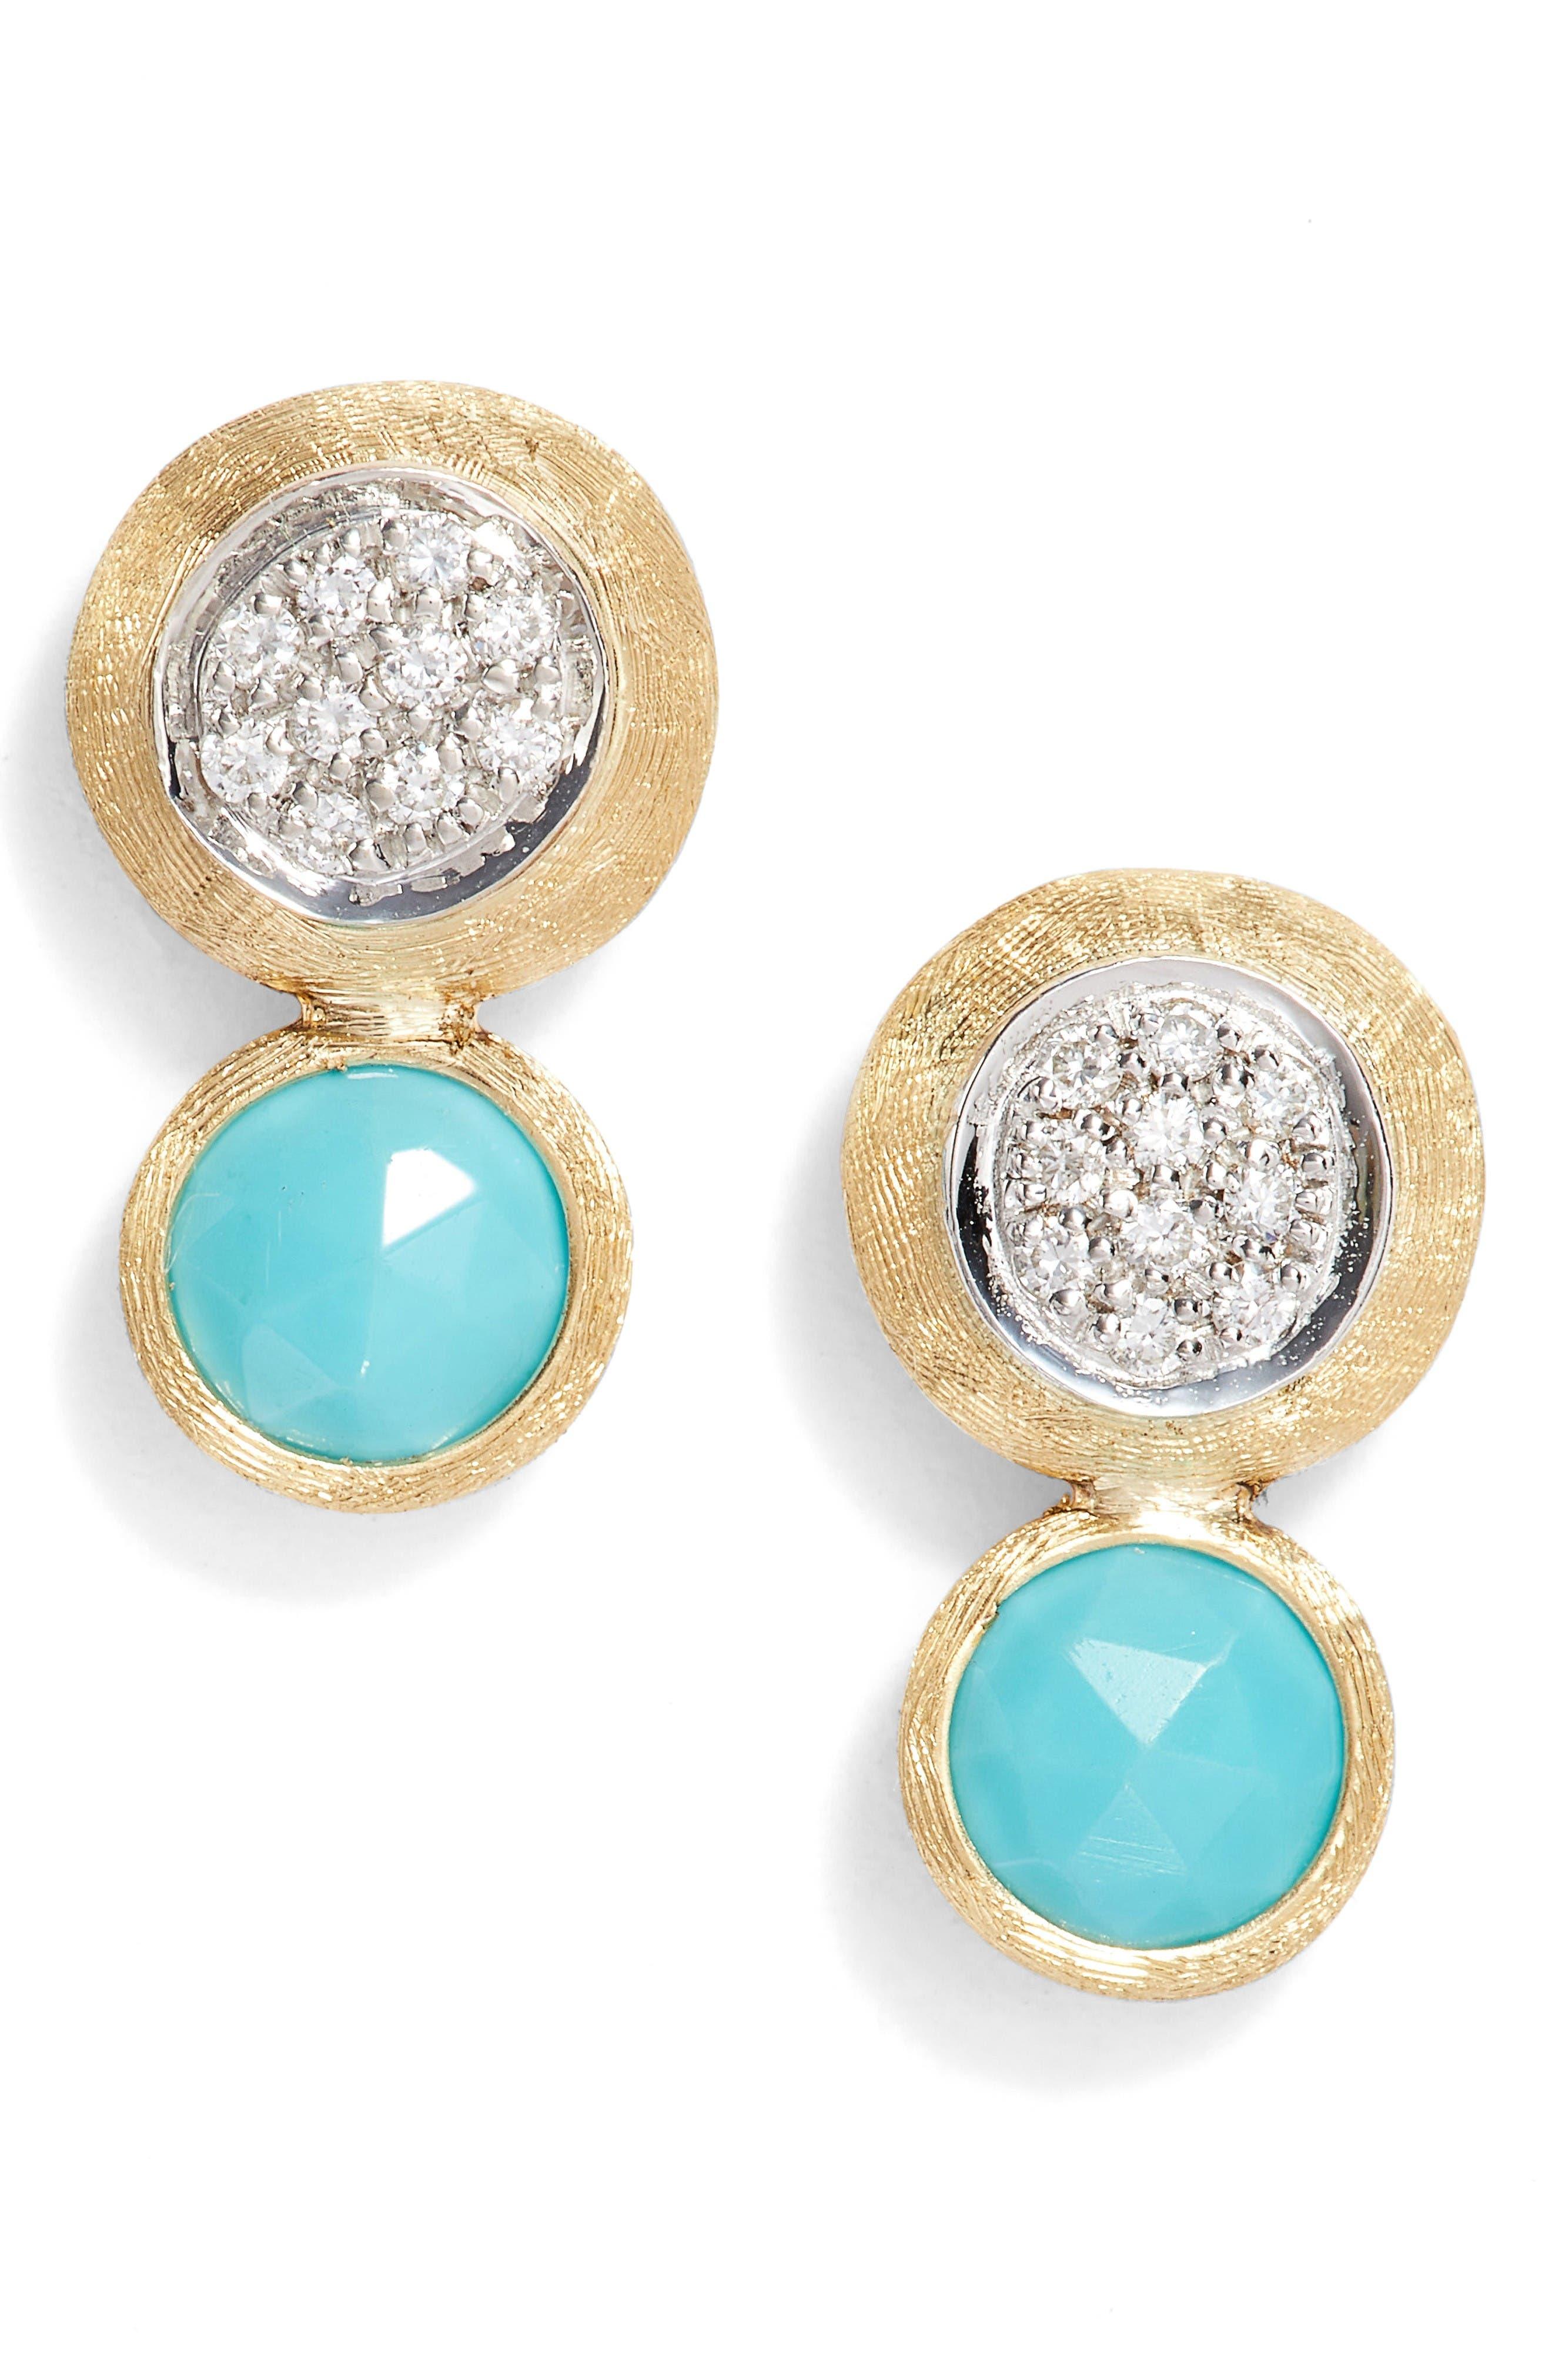 Alternate Image 1 Selected - Marco Bicego Jaipur Diamond & Turquoise Stud Earrings